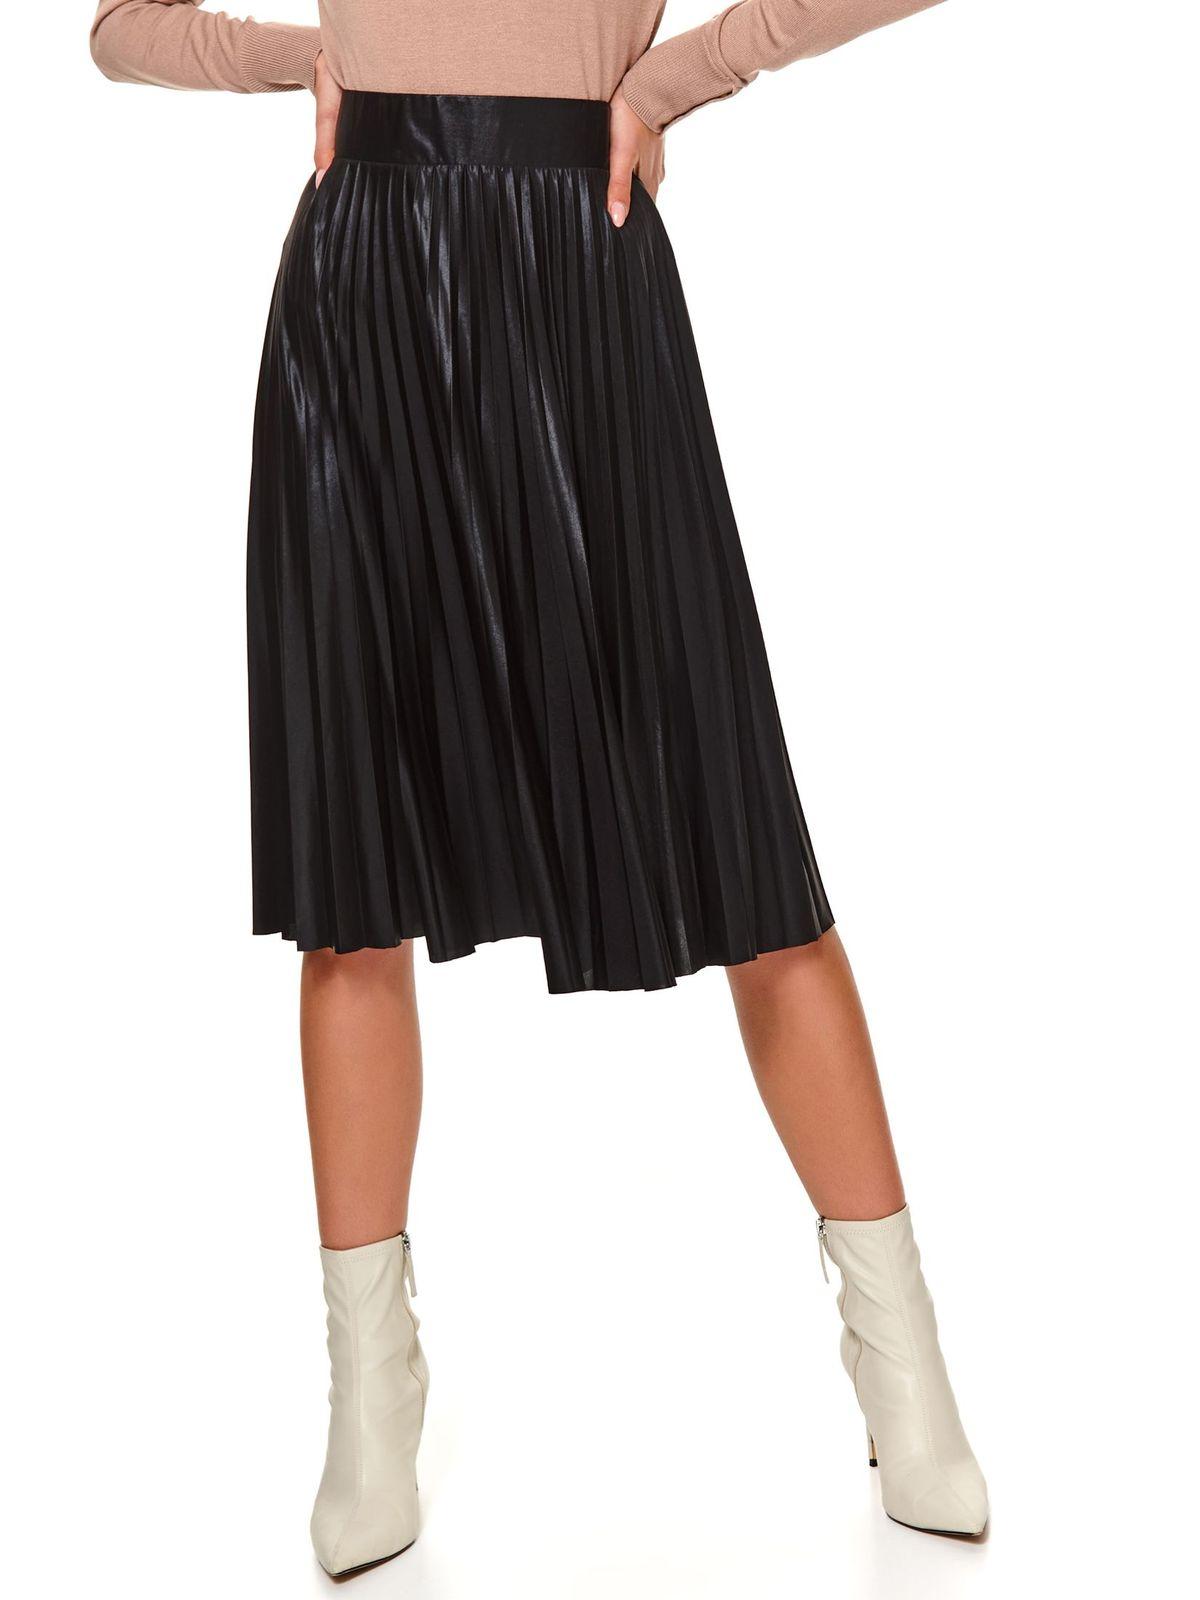 Black skirt cloche high waisted folded up